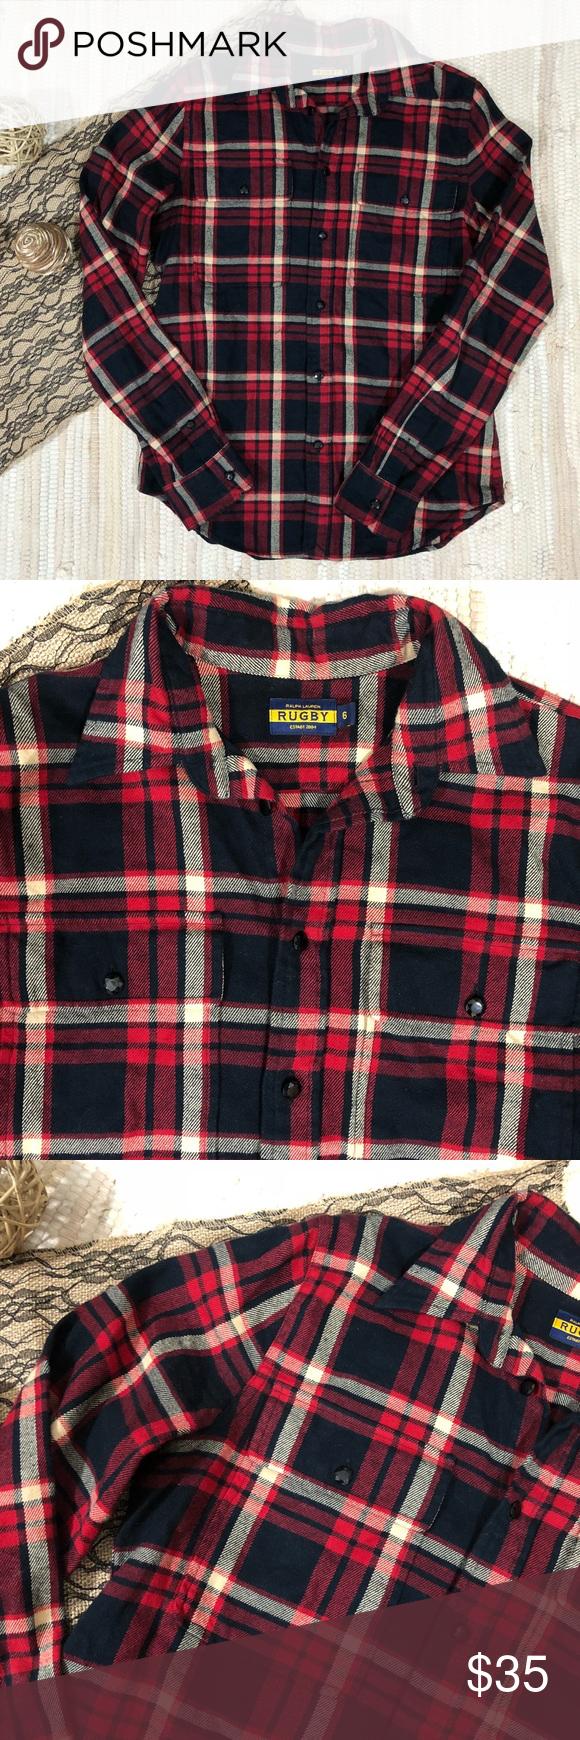 Flannel under shirt  Ralph Lauren Rugby Plaid Flannel Shirt Two front button pockets